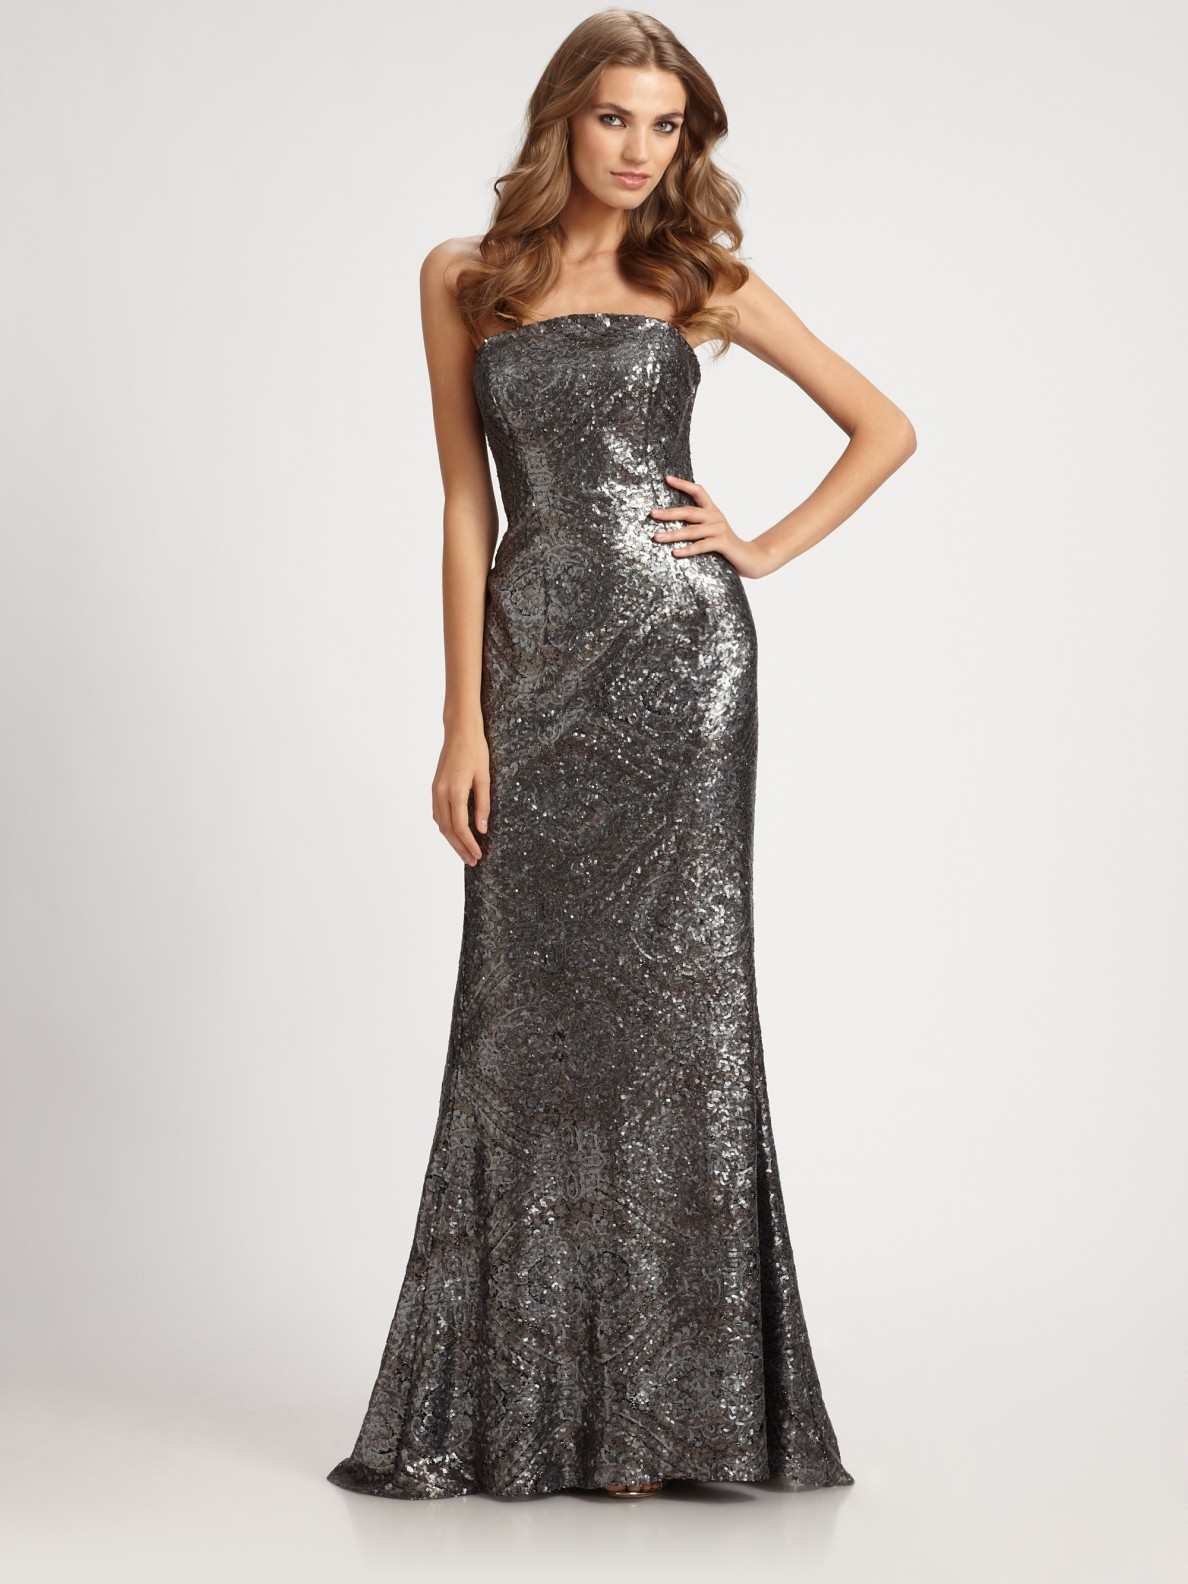 Gun Metal Gown